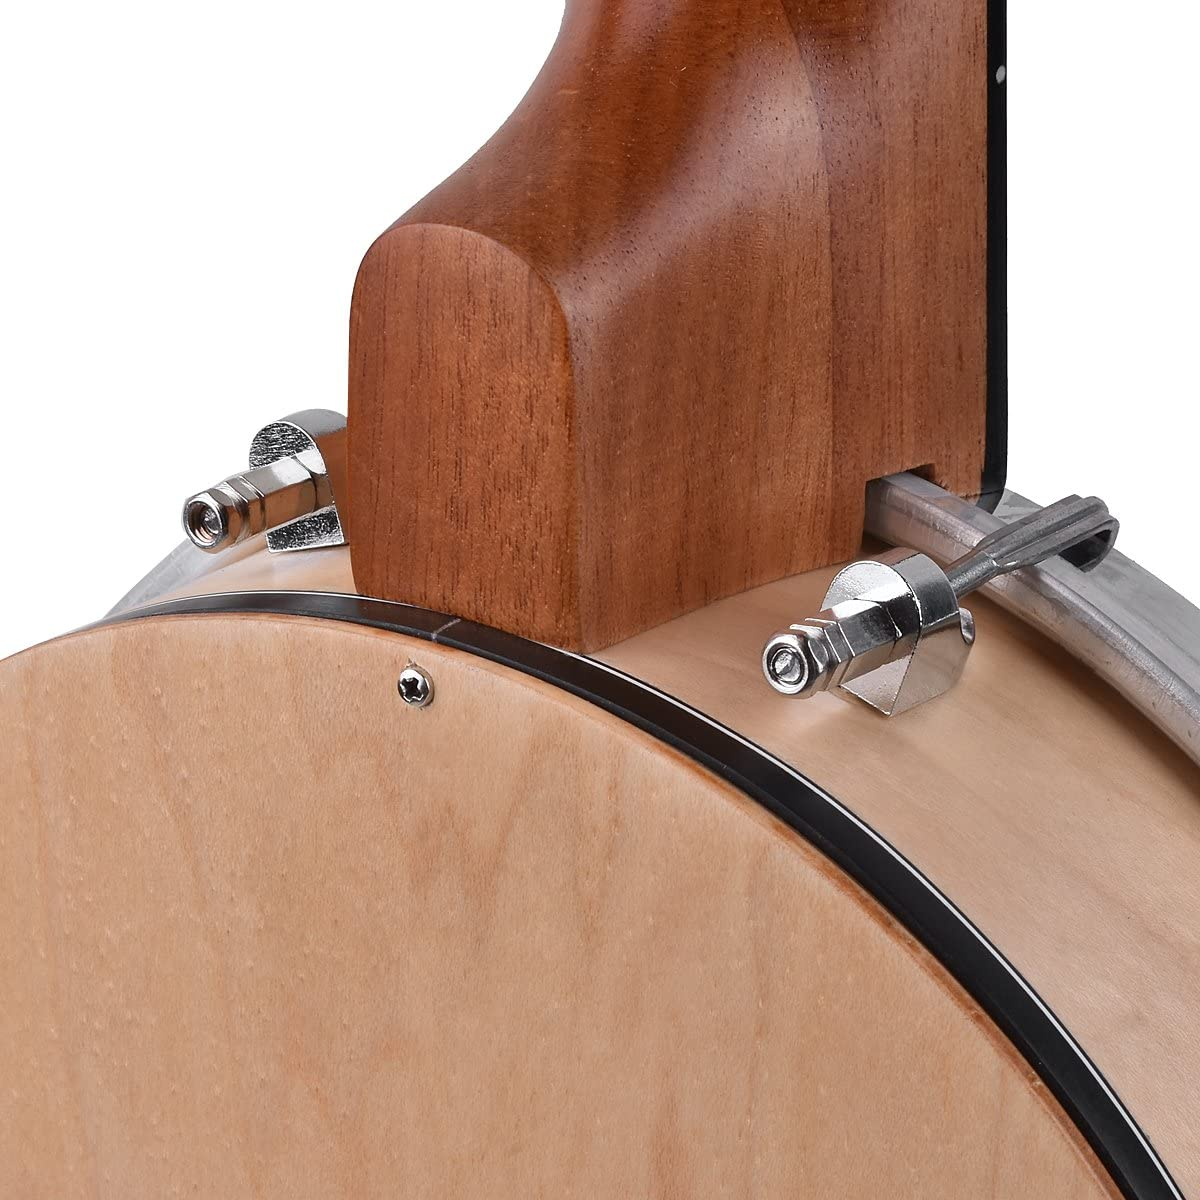 Kmise Banjo Ukulele 4 String Concert Banjos Sapele Aquila String Flying Bird Dots